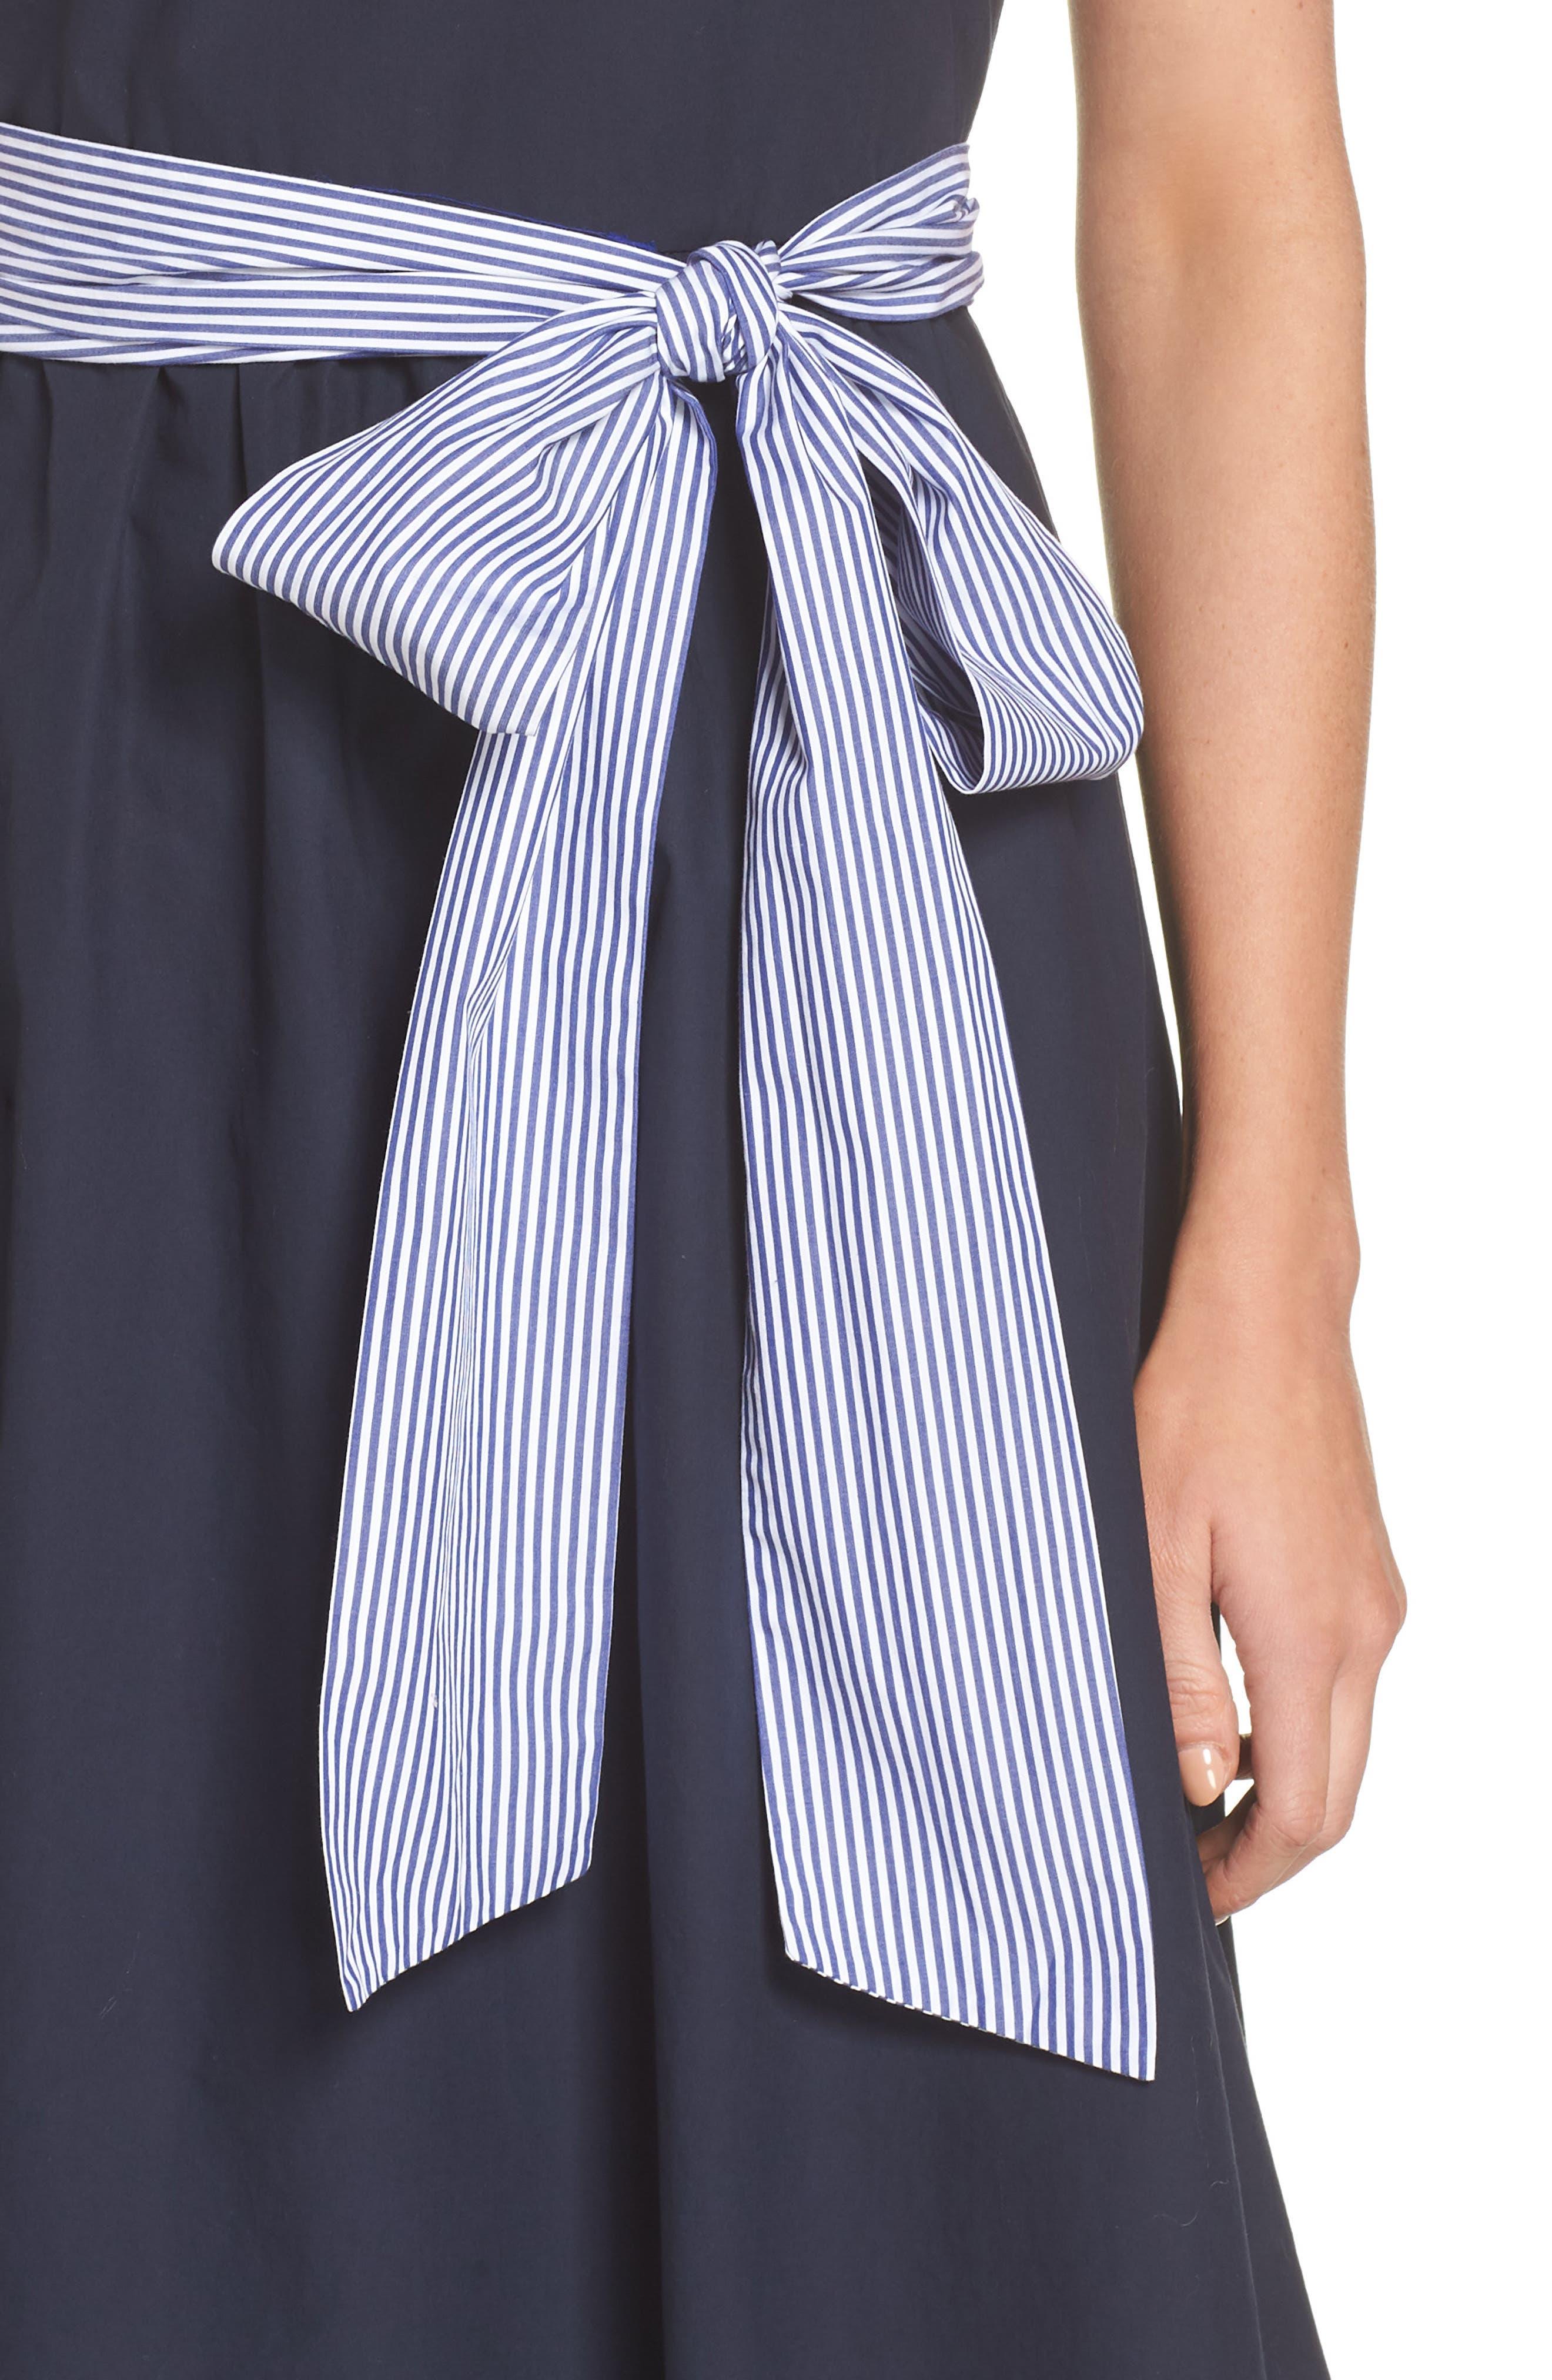 Two-Tone Tie Waist Sheath Dress,                             Alternate thumbnail 4, color,                             401